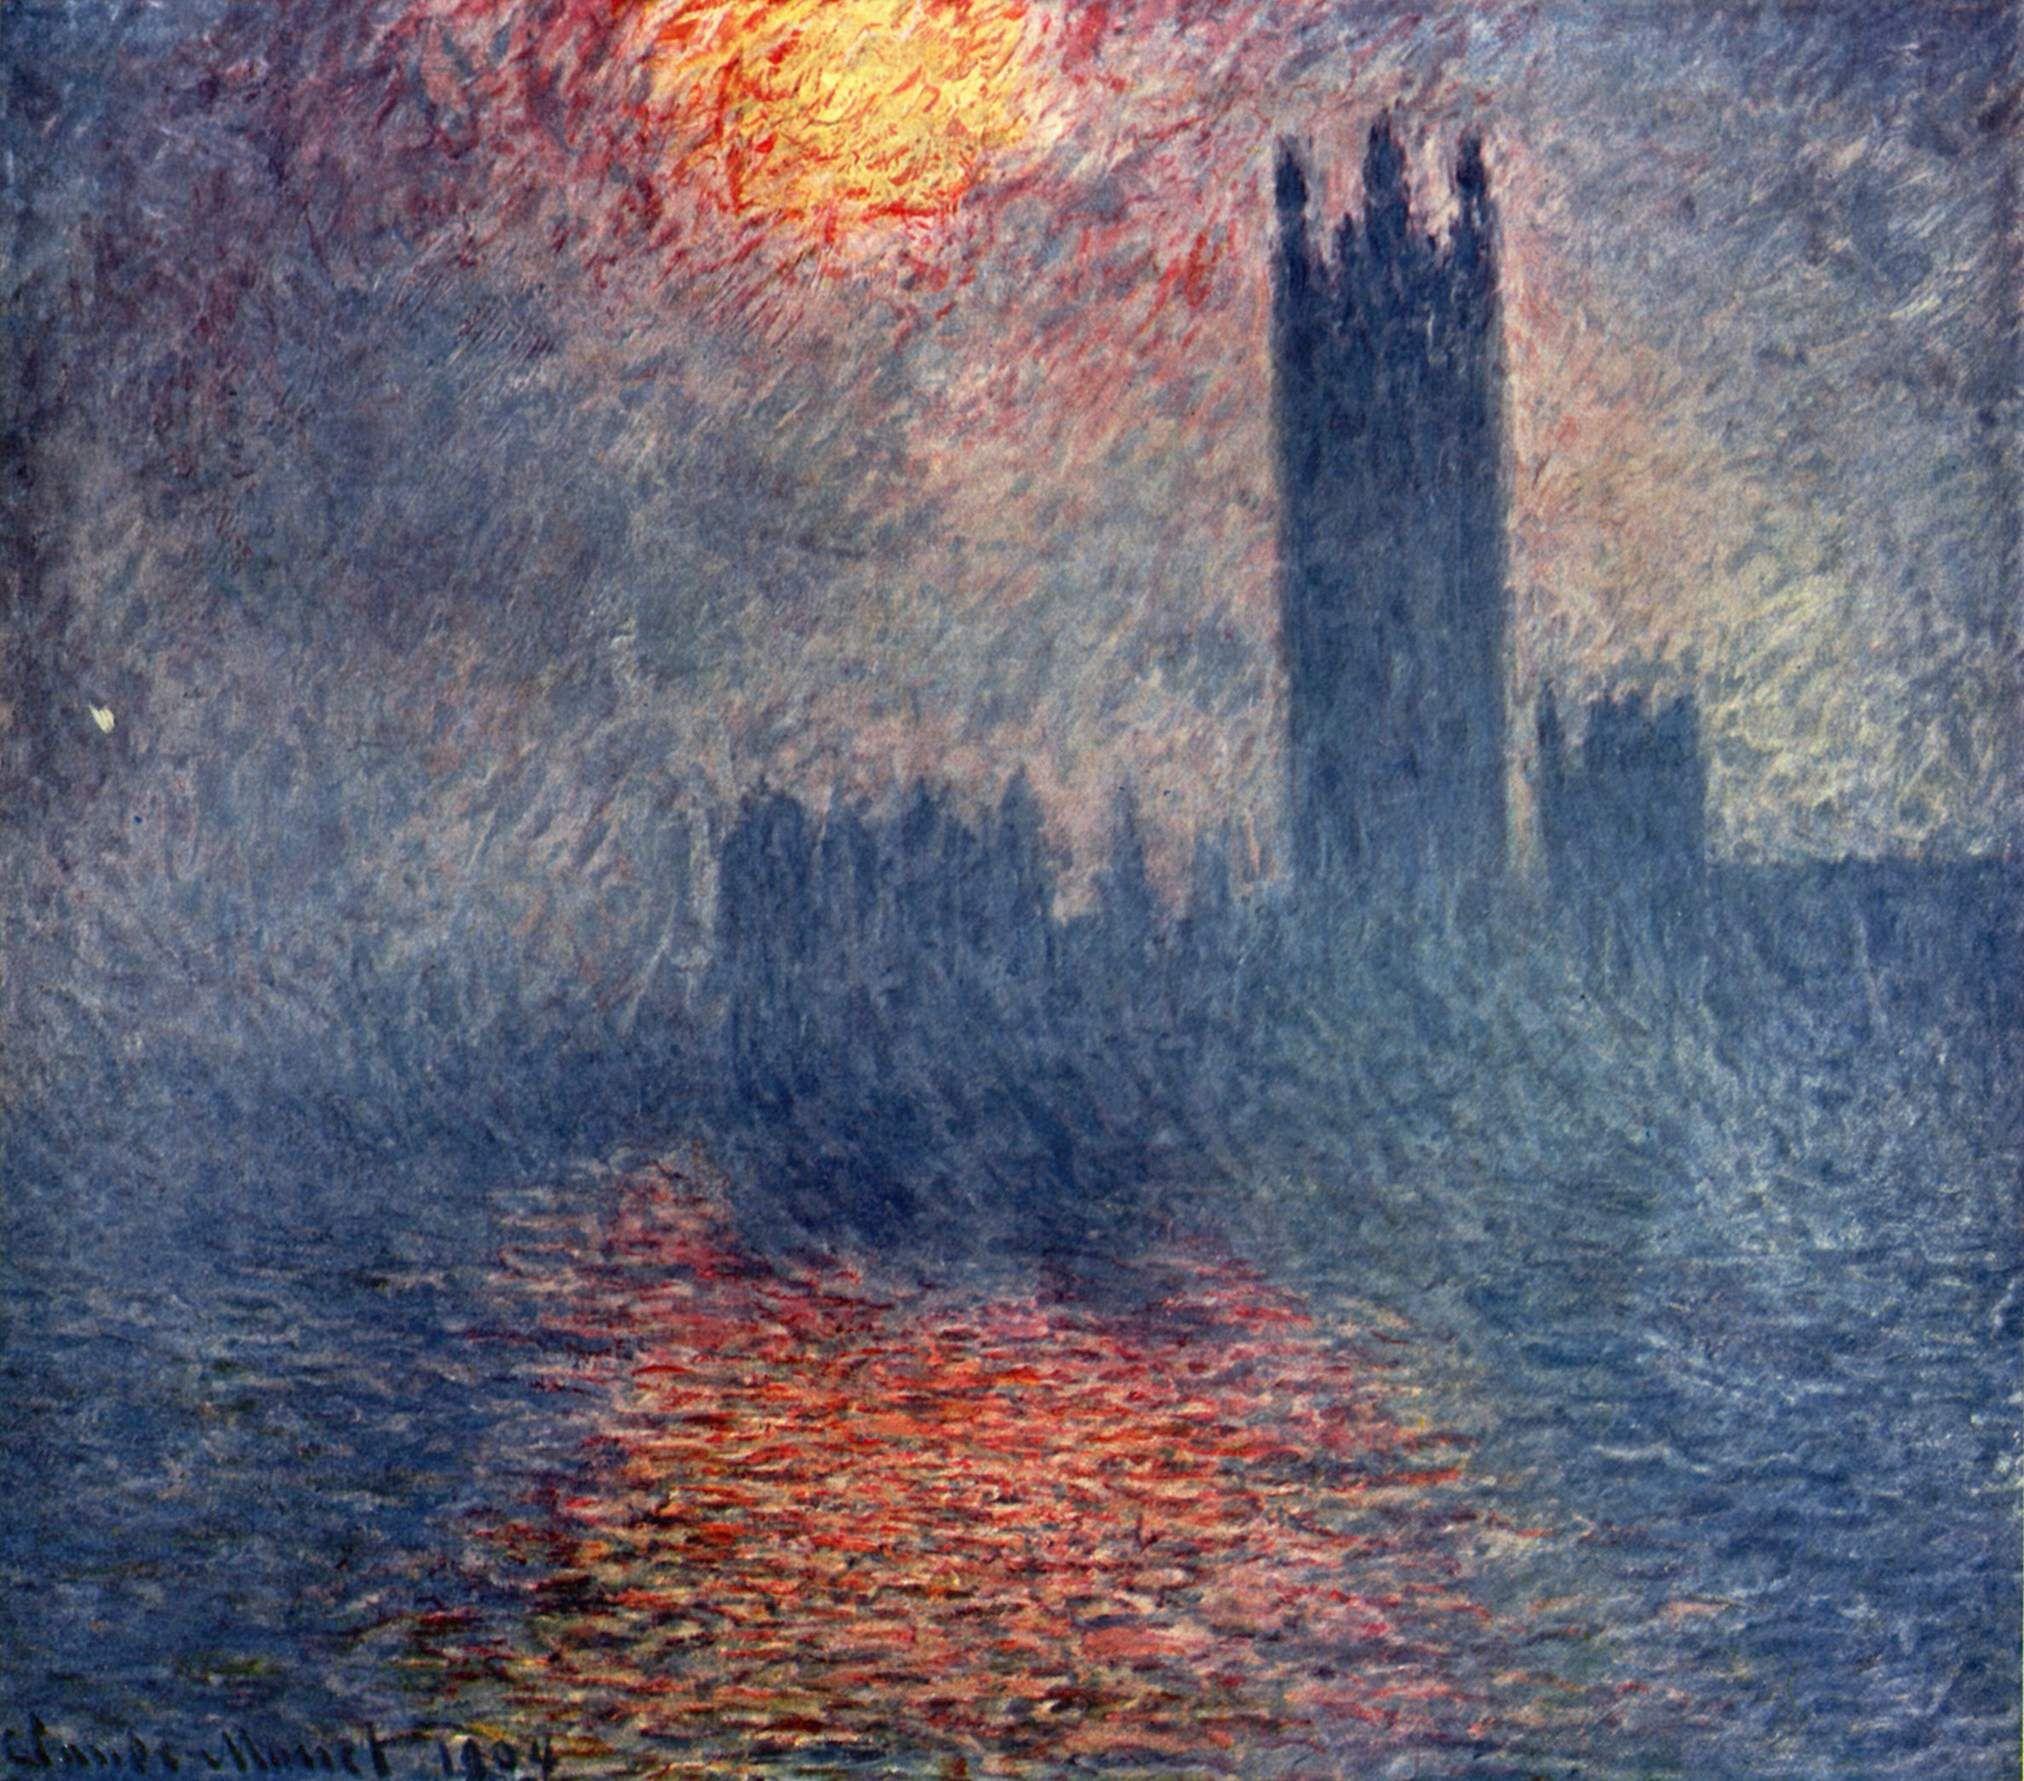 Claude Monet, Parliament